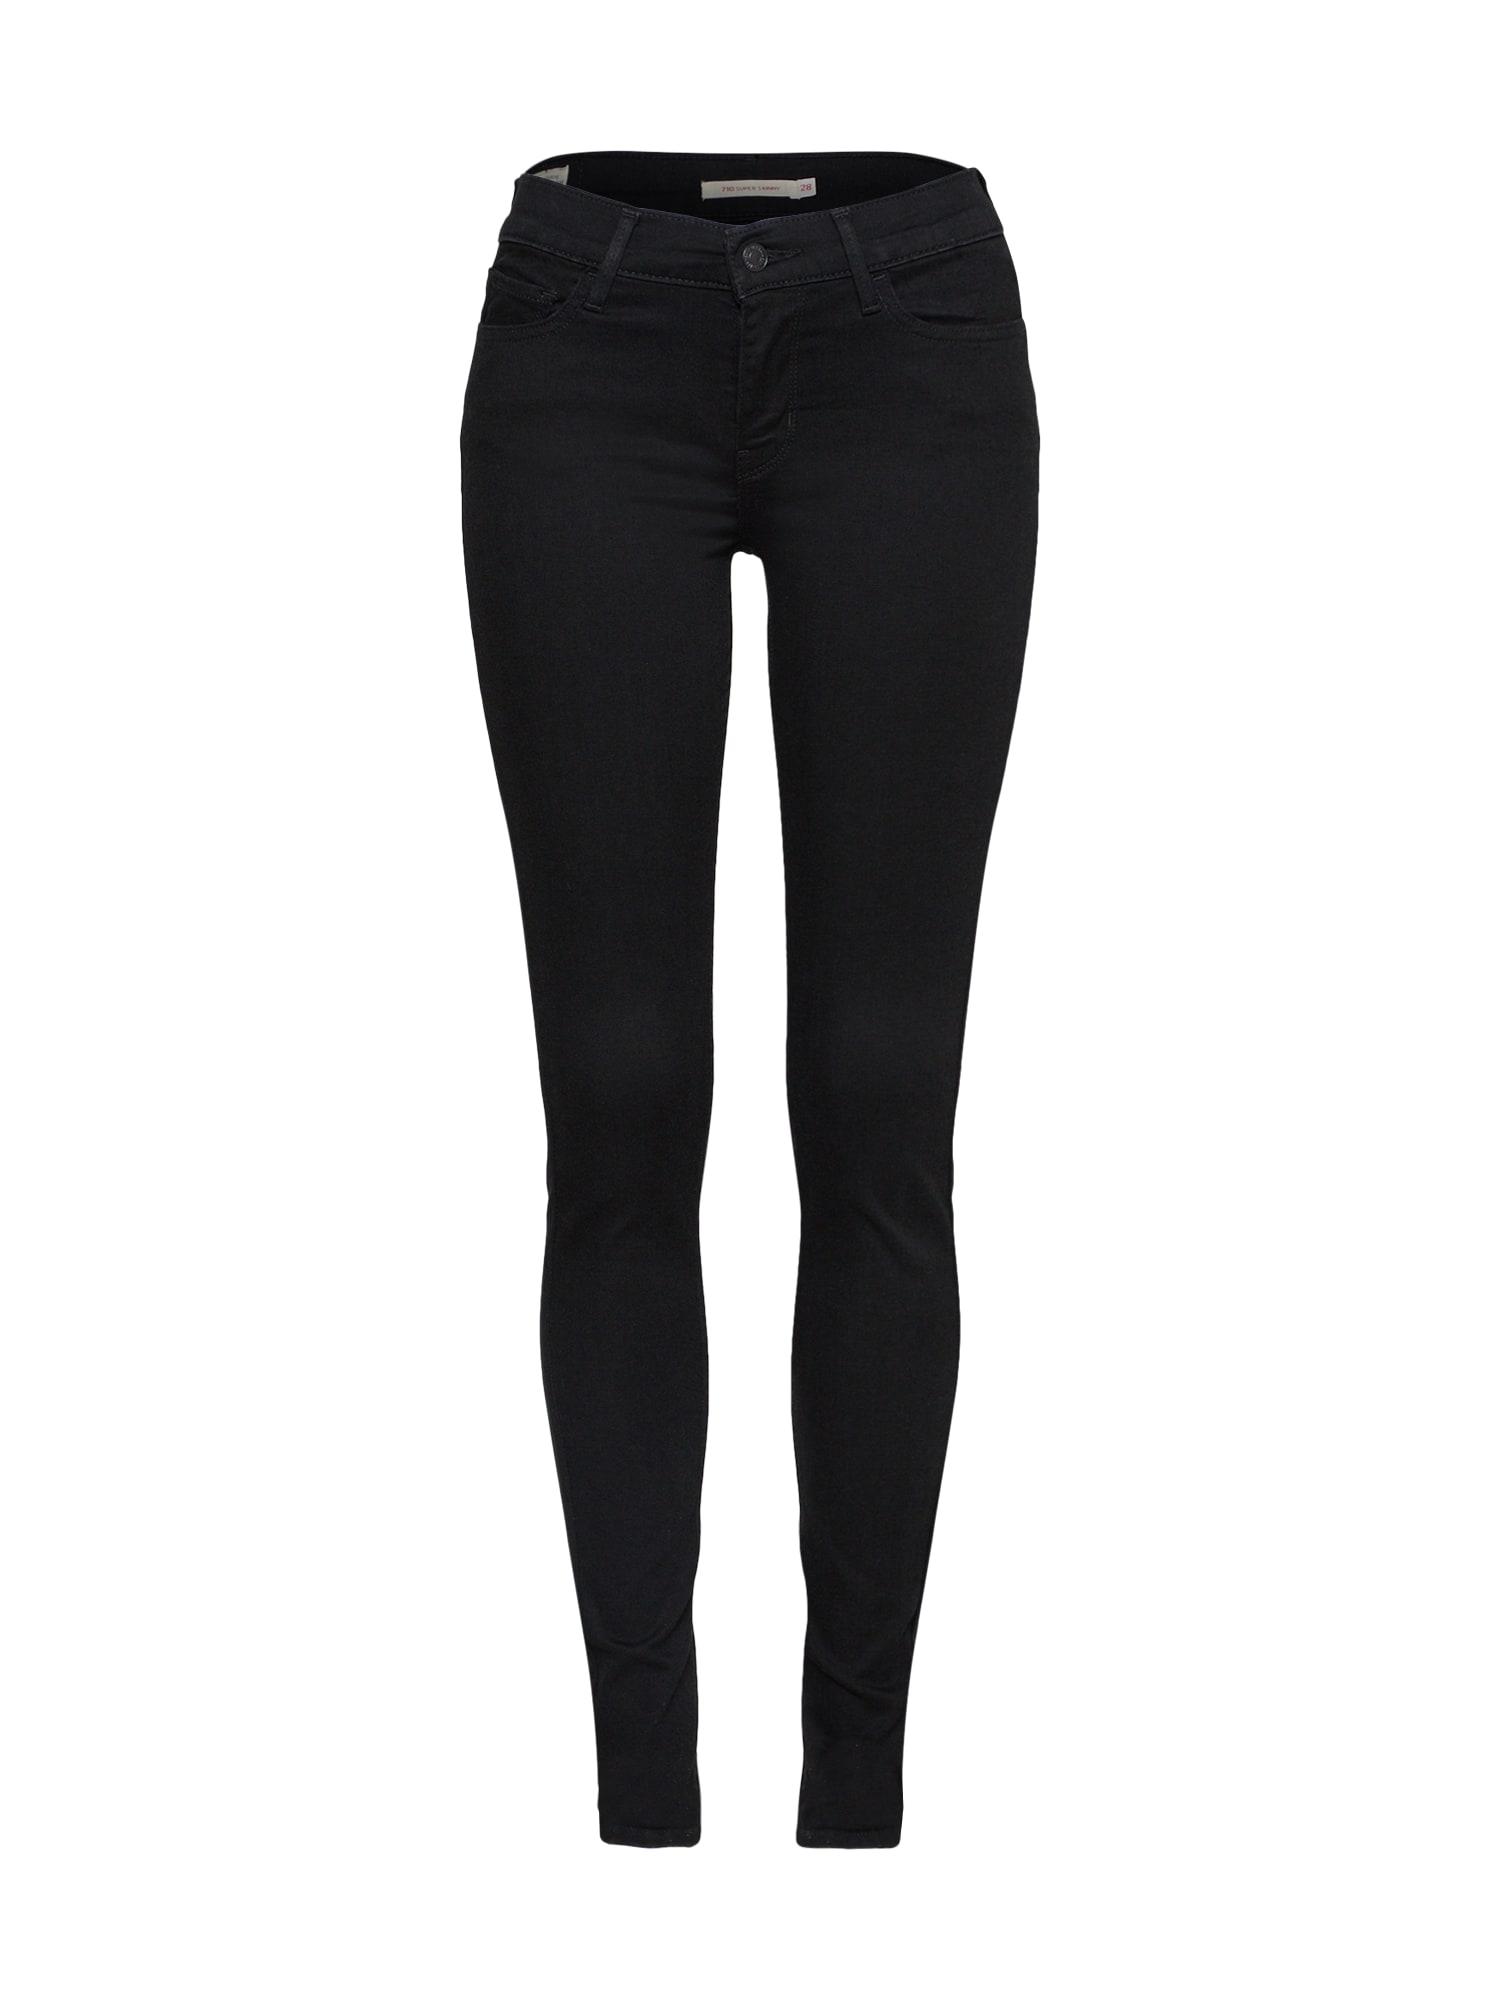 LEVI'S Dames Jeans 710 Innovation Super Skinny black denim